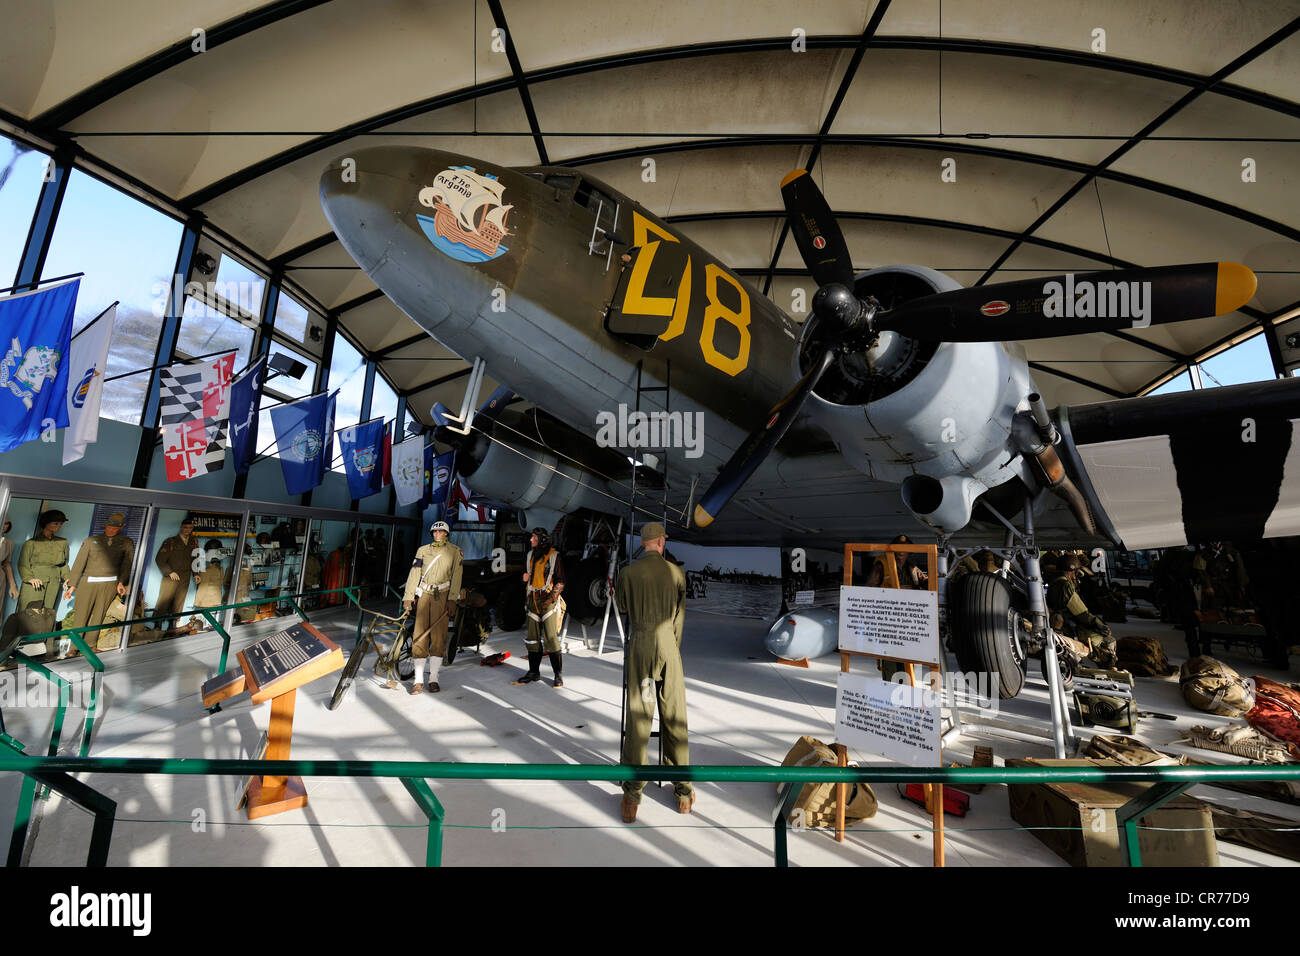 France, Manche, Sainte Mere Eglise, Airborne Museum Stock Photo